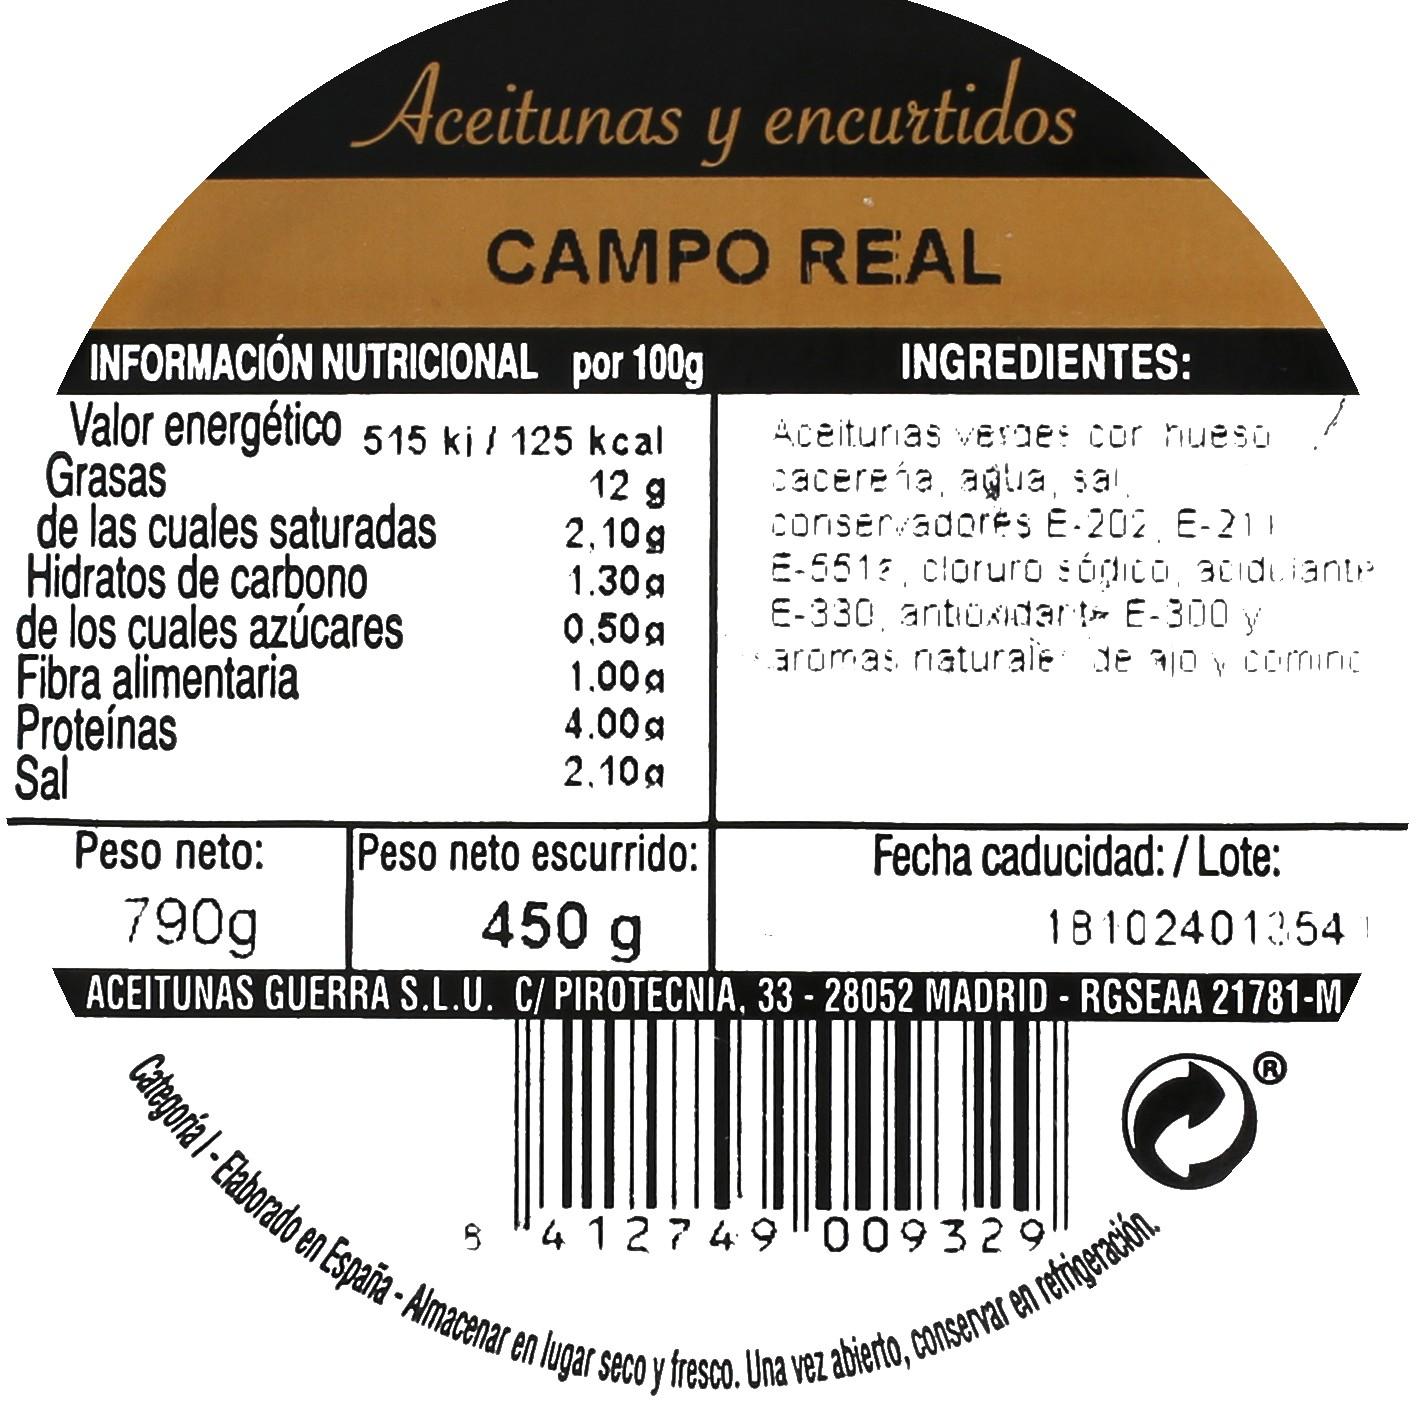 Aceitunas Campo Real - 3